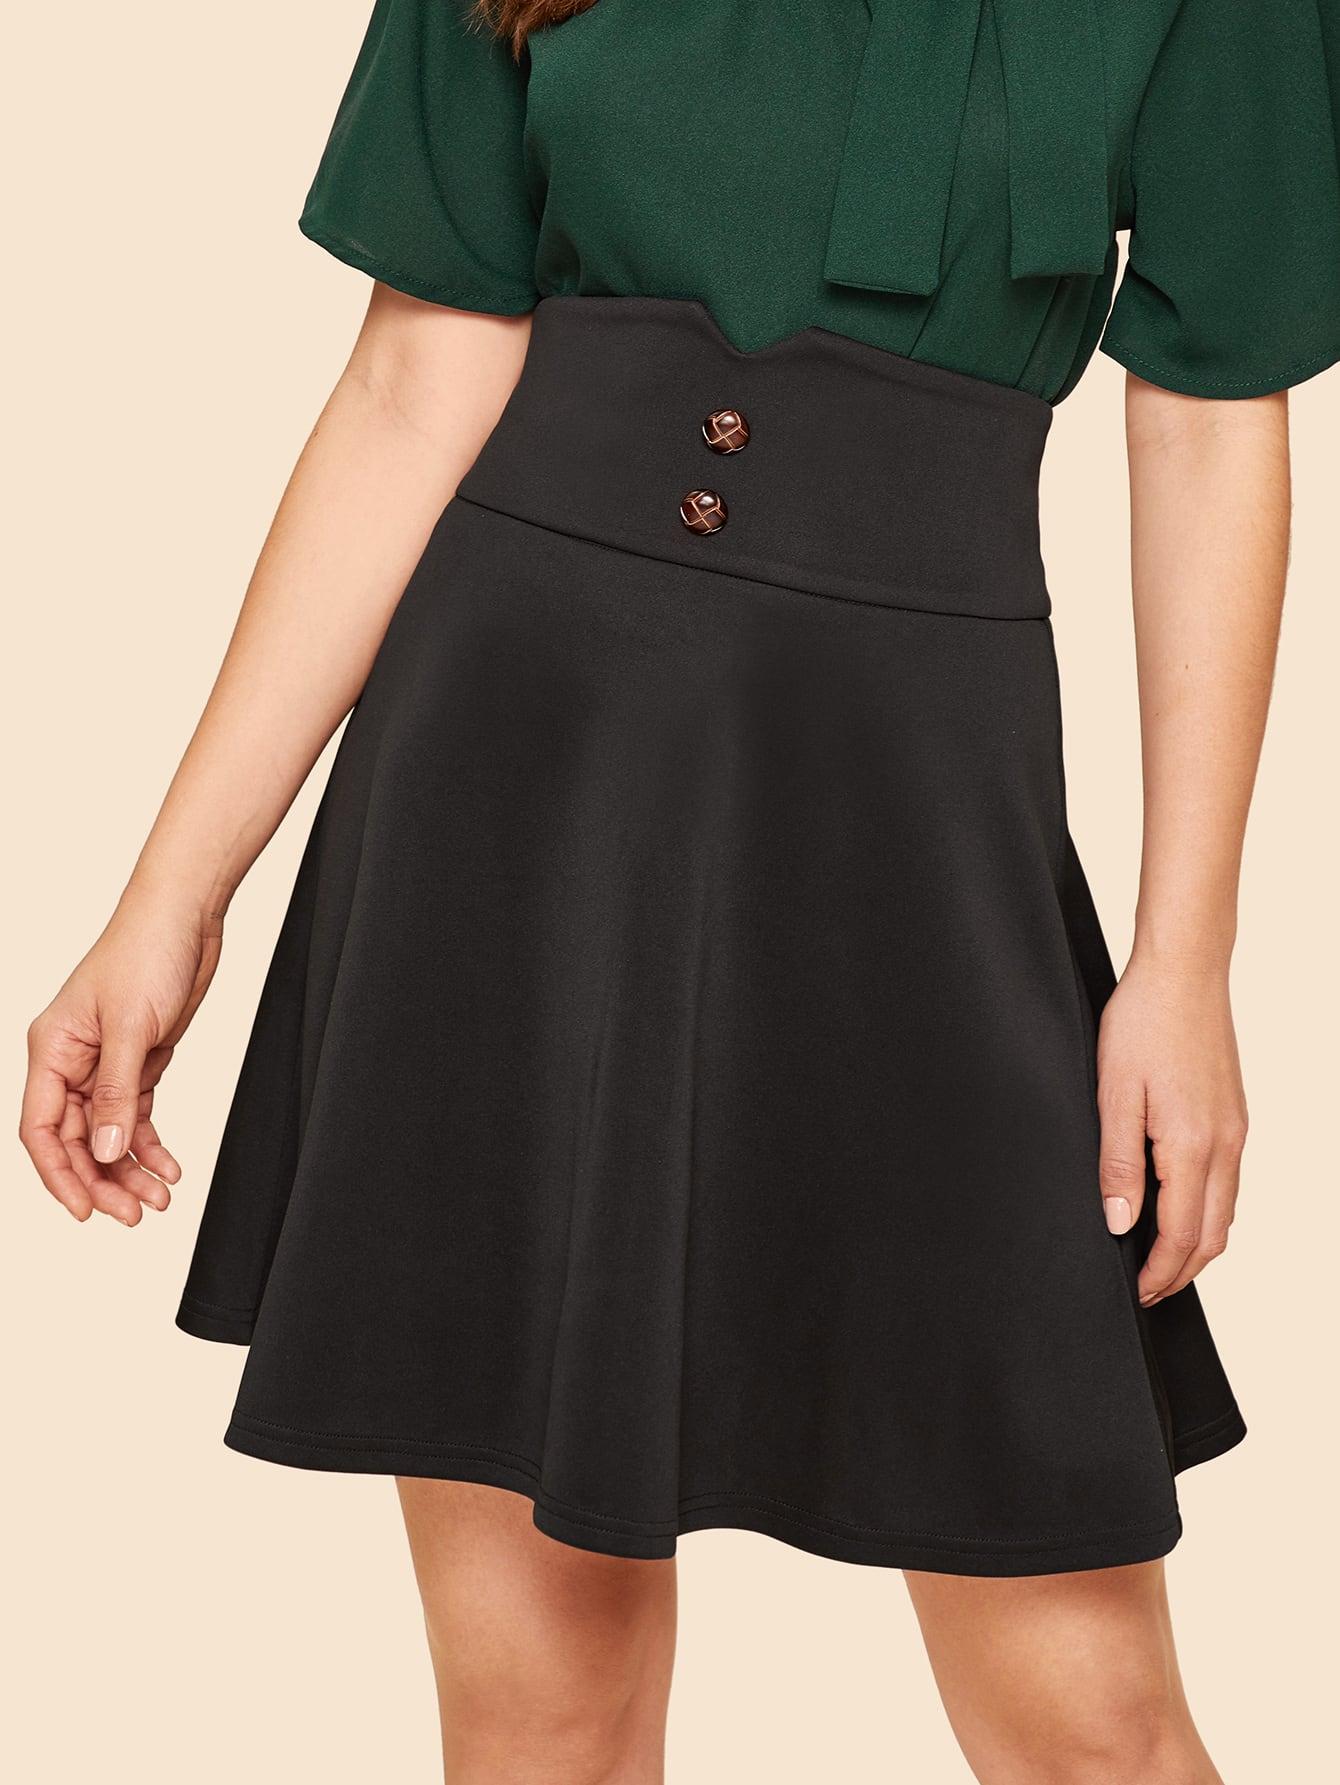 40s юбка с пуговицами и широкой талией thumbnail